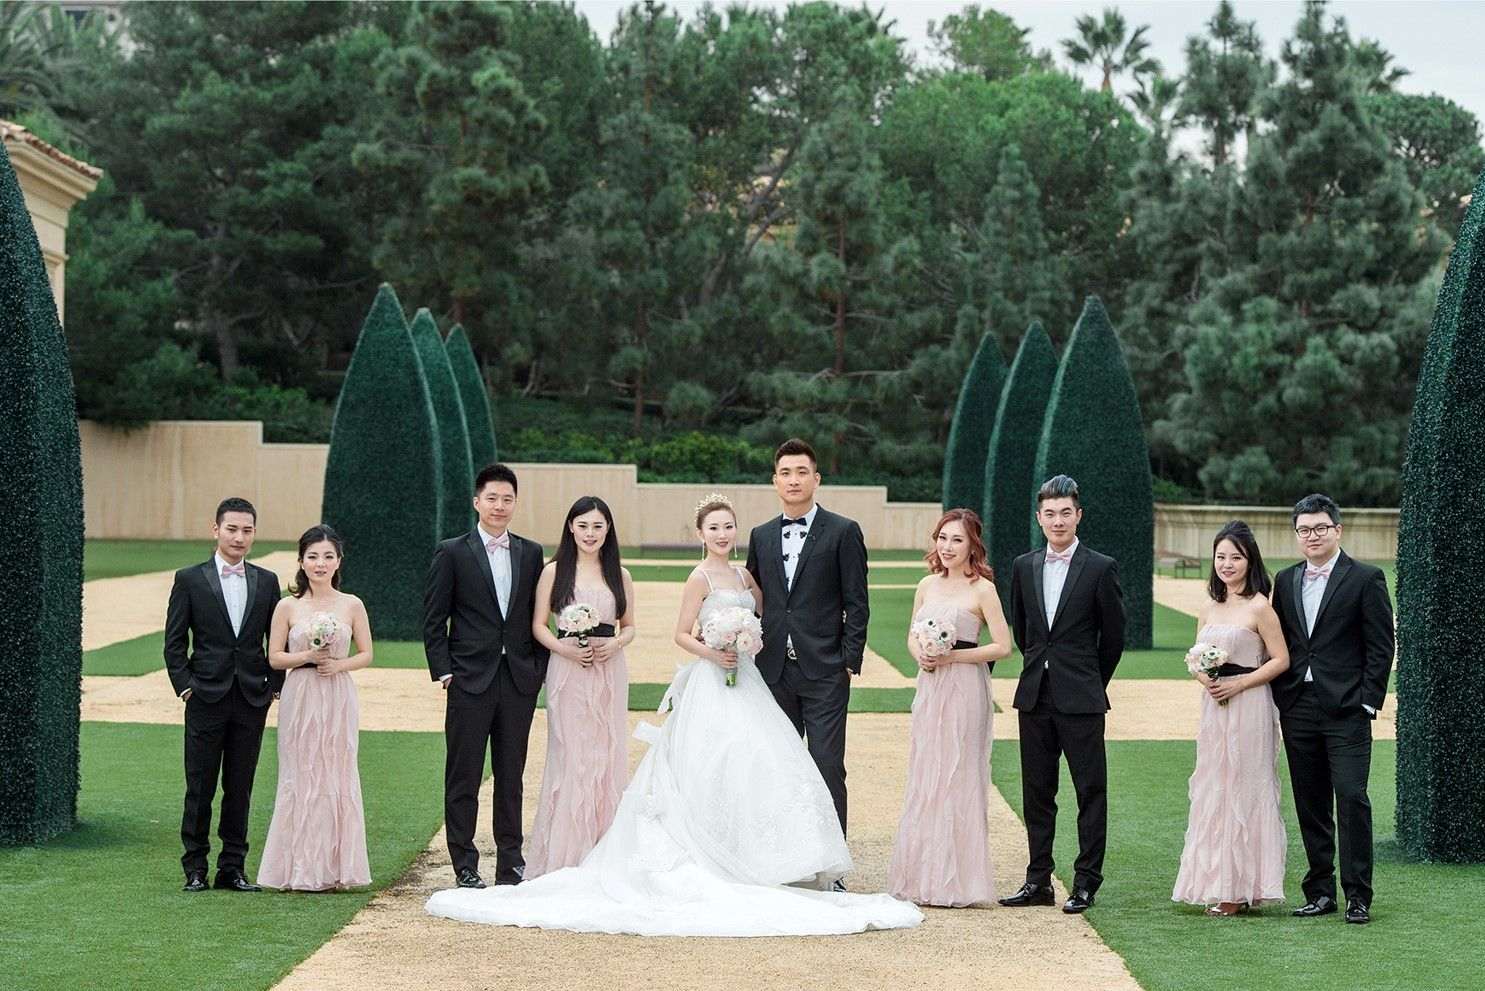 The-Resort-at-Pelican-Hill-Weddings-29.jpg